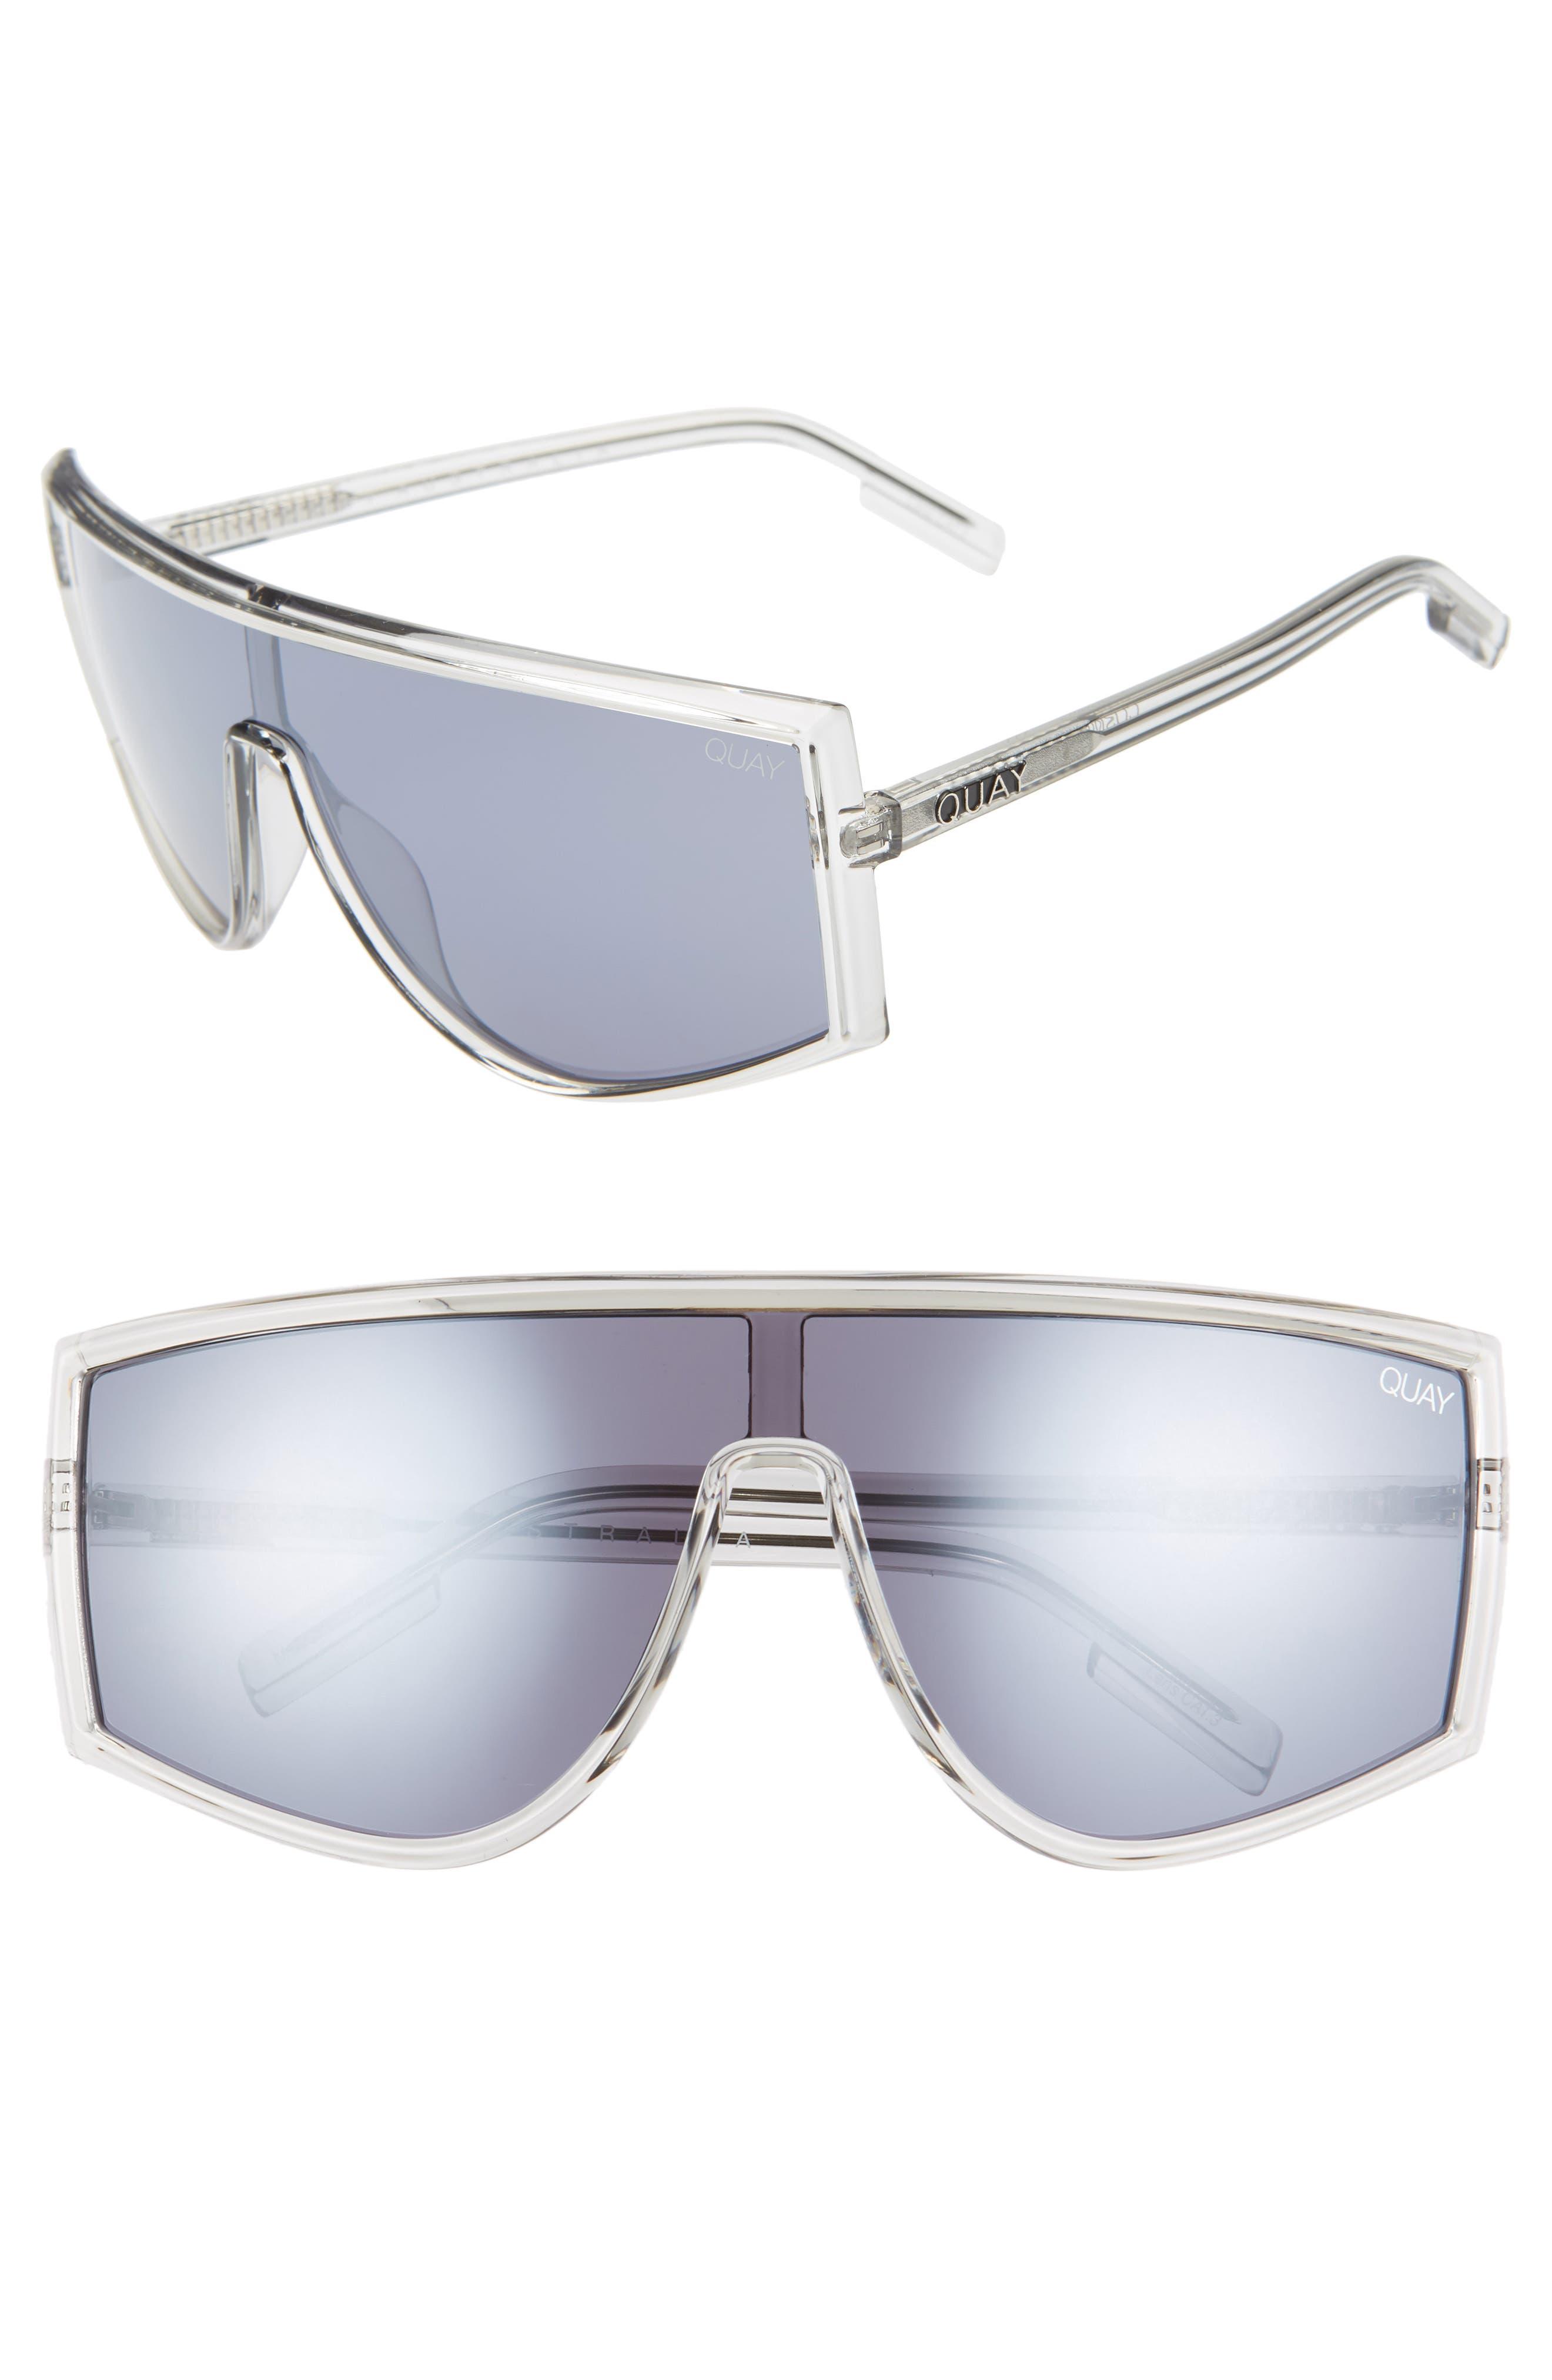 Quay Australia Cosmic 140Mm Shield Sunglasses - Grey/ Smoke